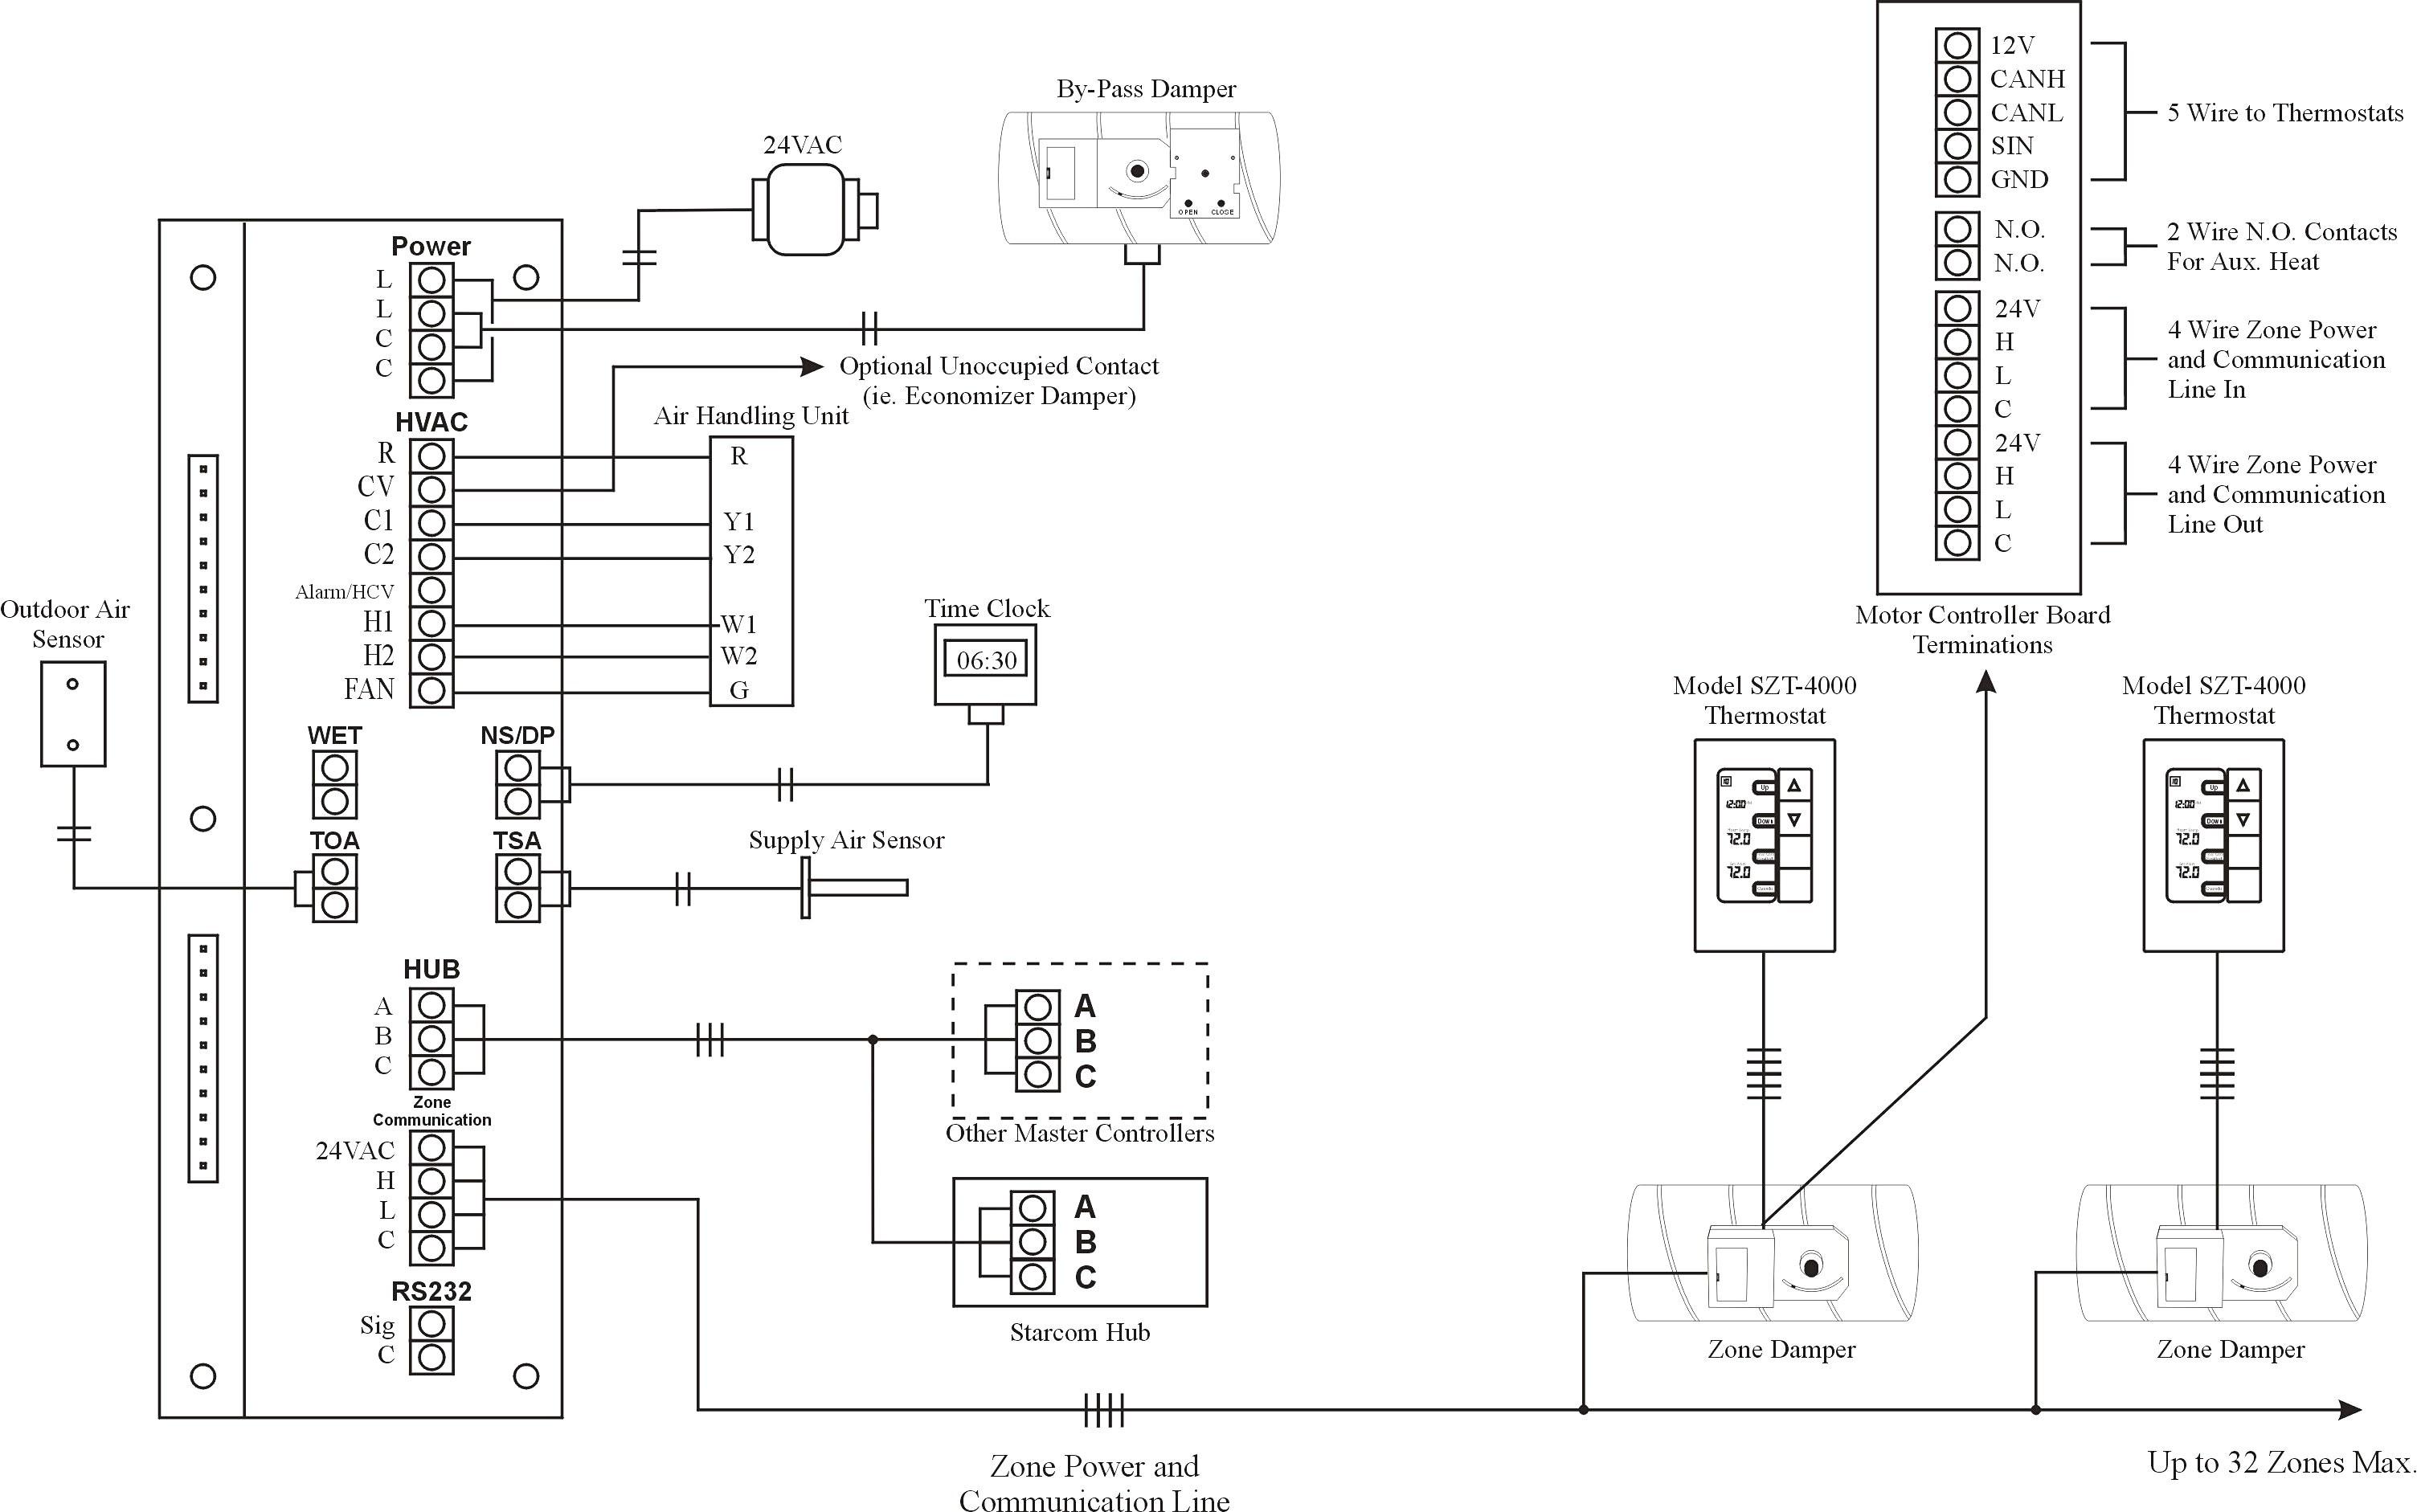 1996 Honda Accord Engine Diagram My Wiring Motor Cb 900 Diagrams Instructions Of